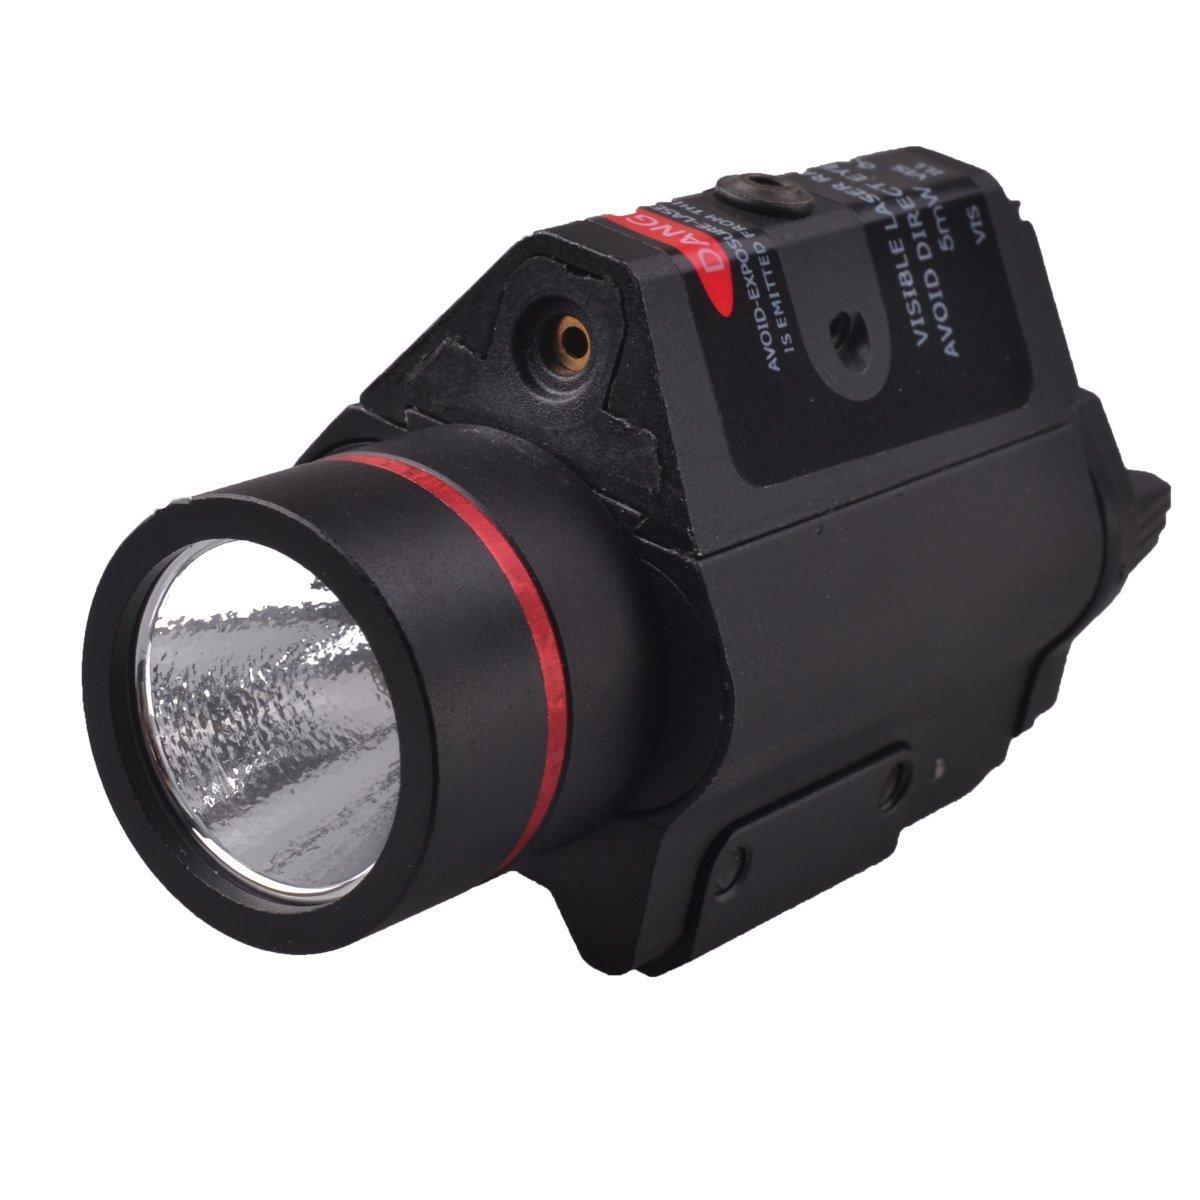 Freehawk® Rifle Scope/Gun Laser/Airsoft Laser/Gun Sights/Gun Lights, RichFire SF-P15 5mW Red Laser Gun Sight w/ Mount+LED Tactical Pistol Flashlight-Black(2 x CR123A)